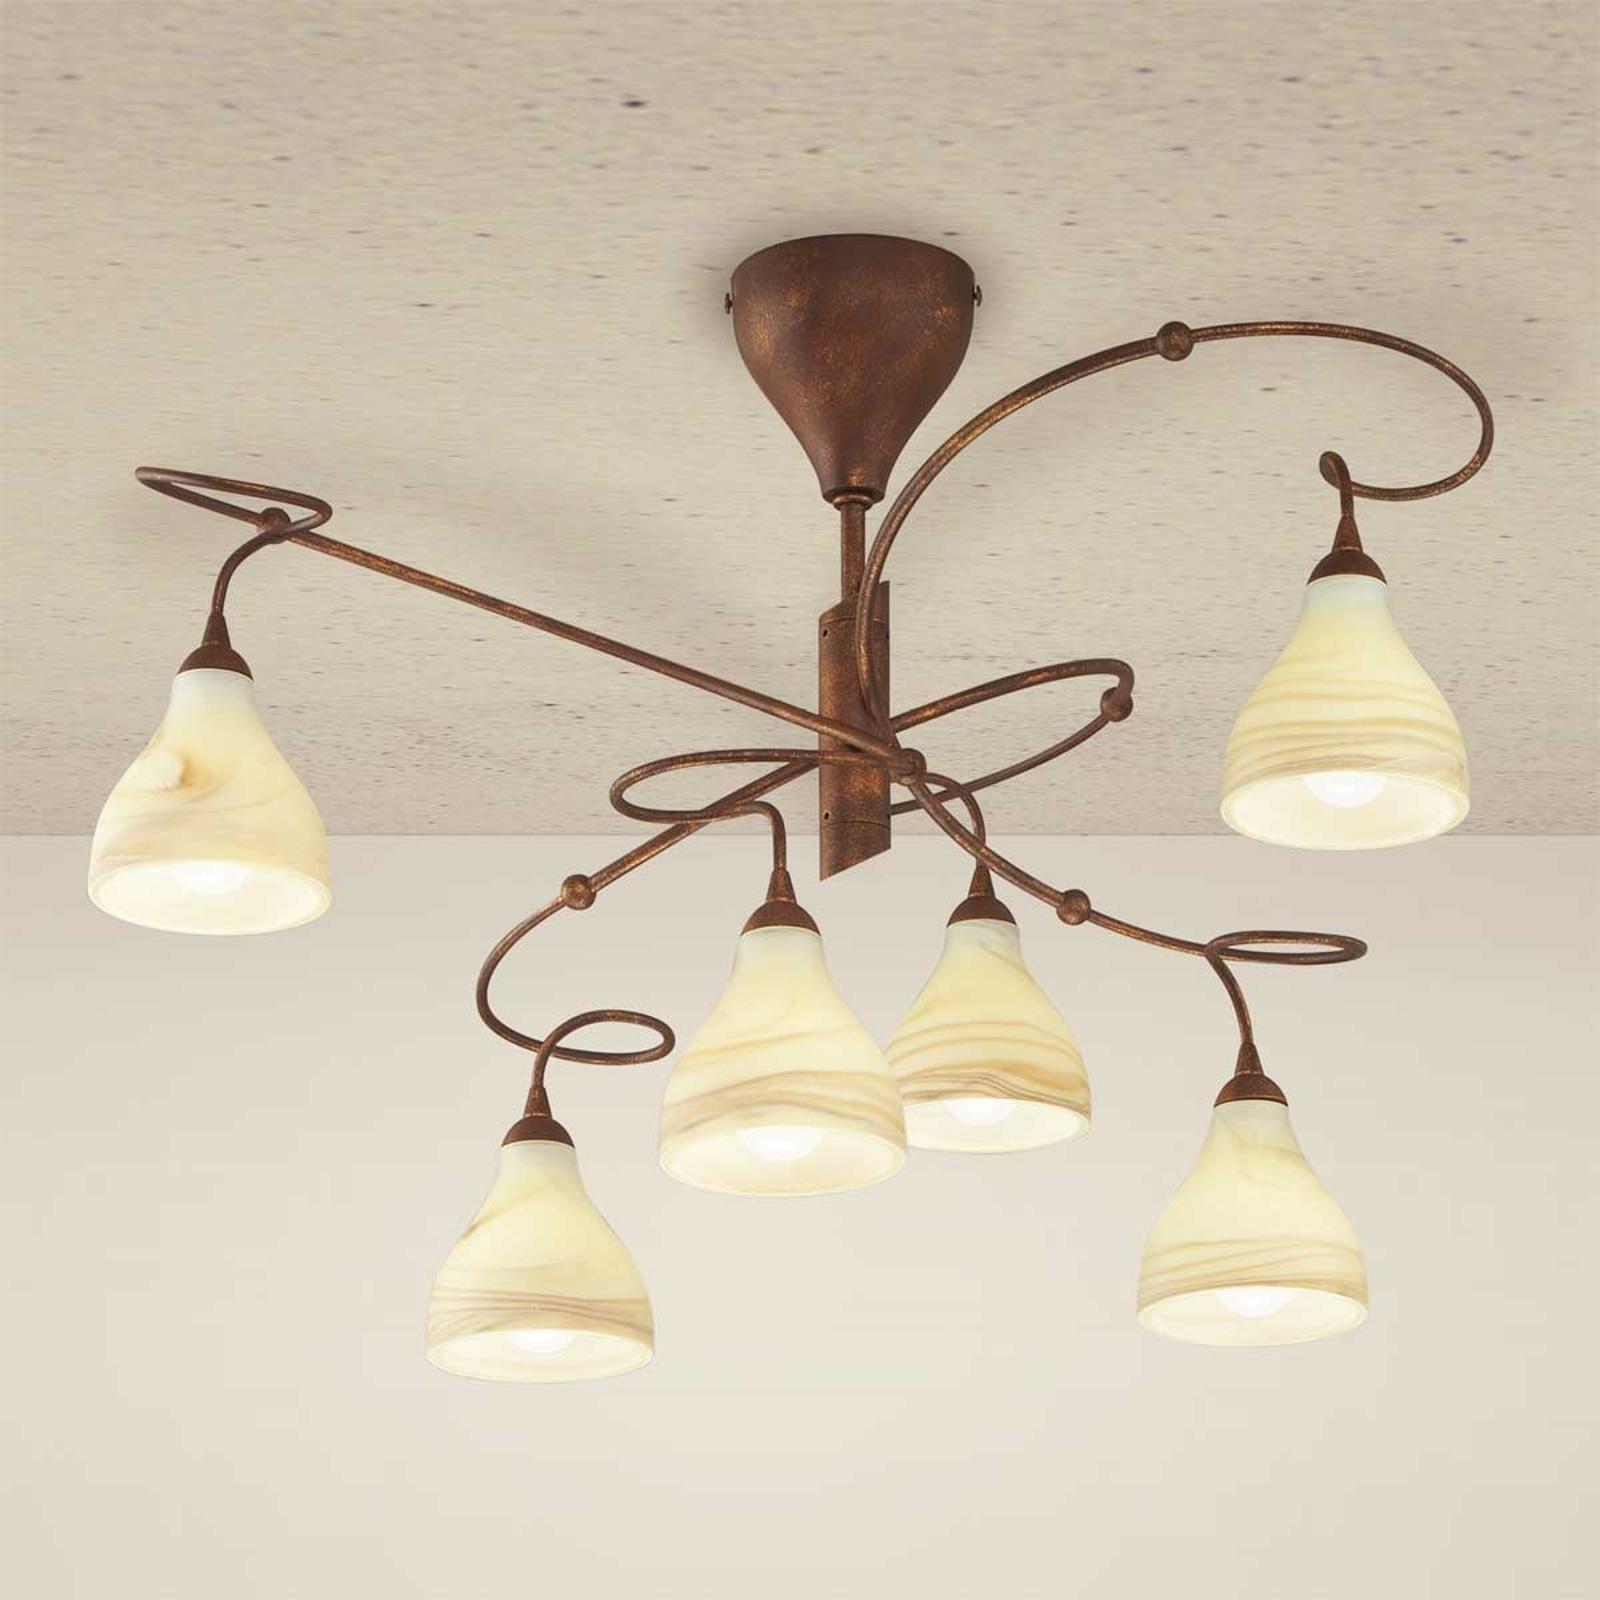 Landhuis-plafondlamp Mattia, 6-lichts